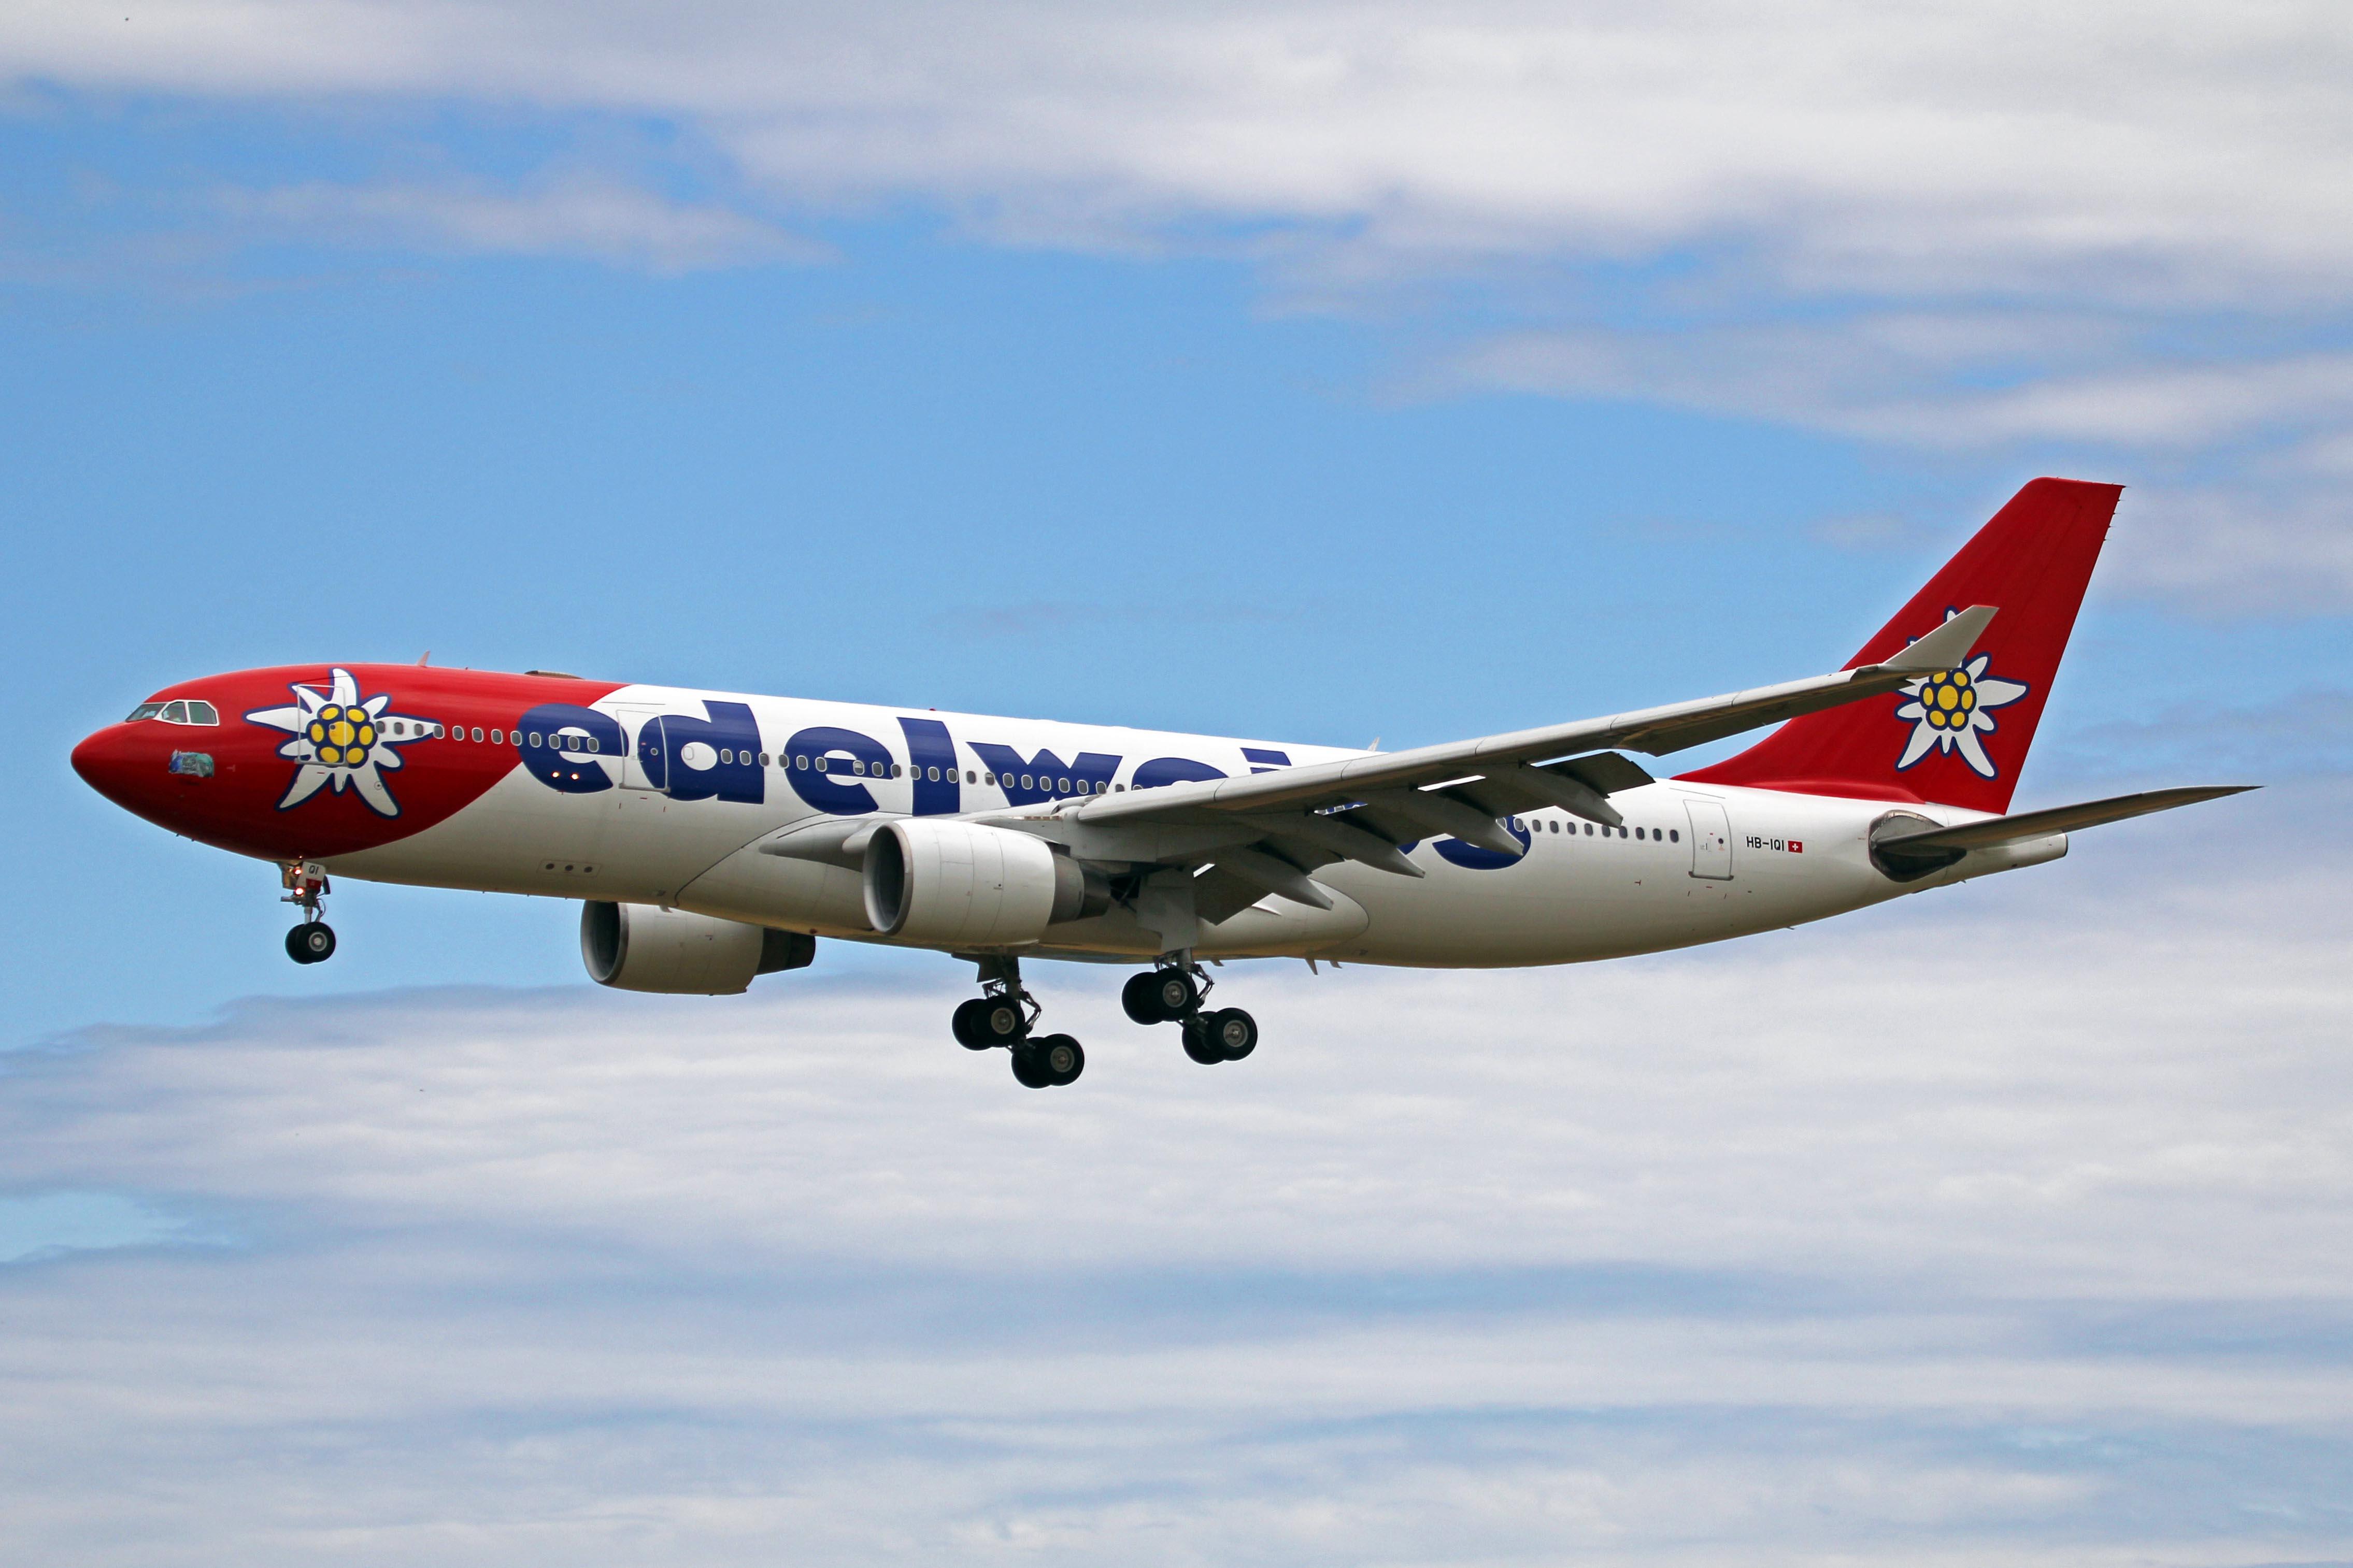 HB-IQI_A330-223_Edelweiss_Air_PMI_01JUN13_(8914169816)